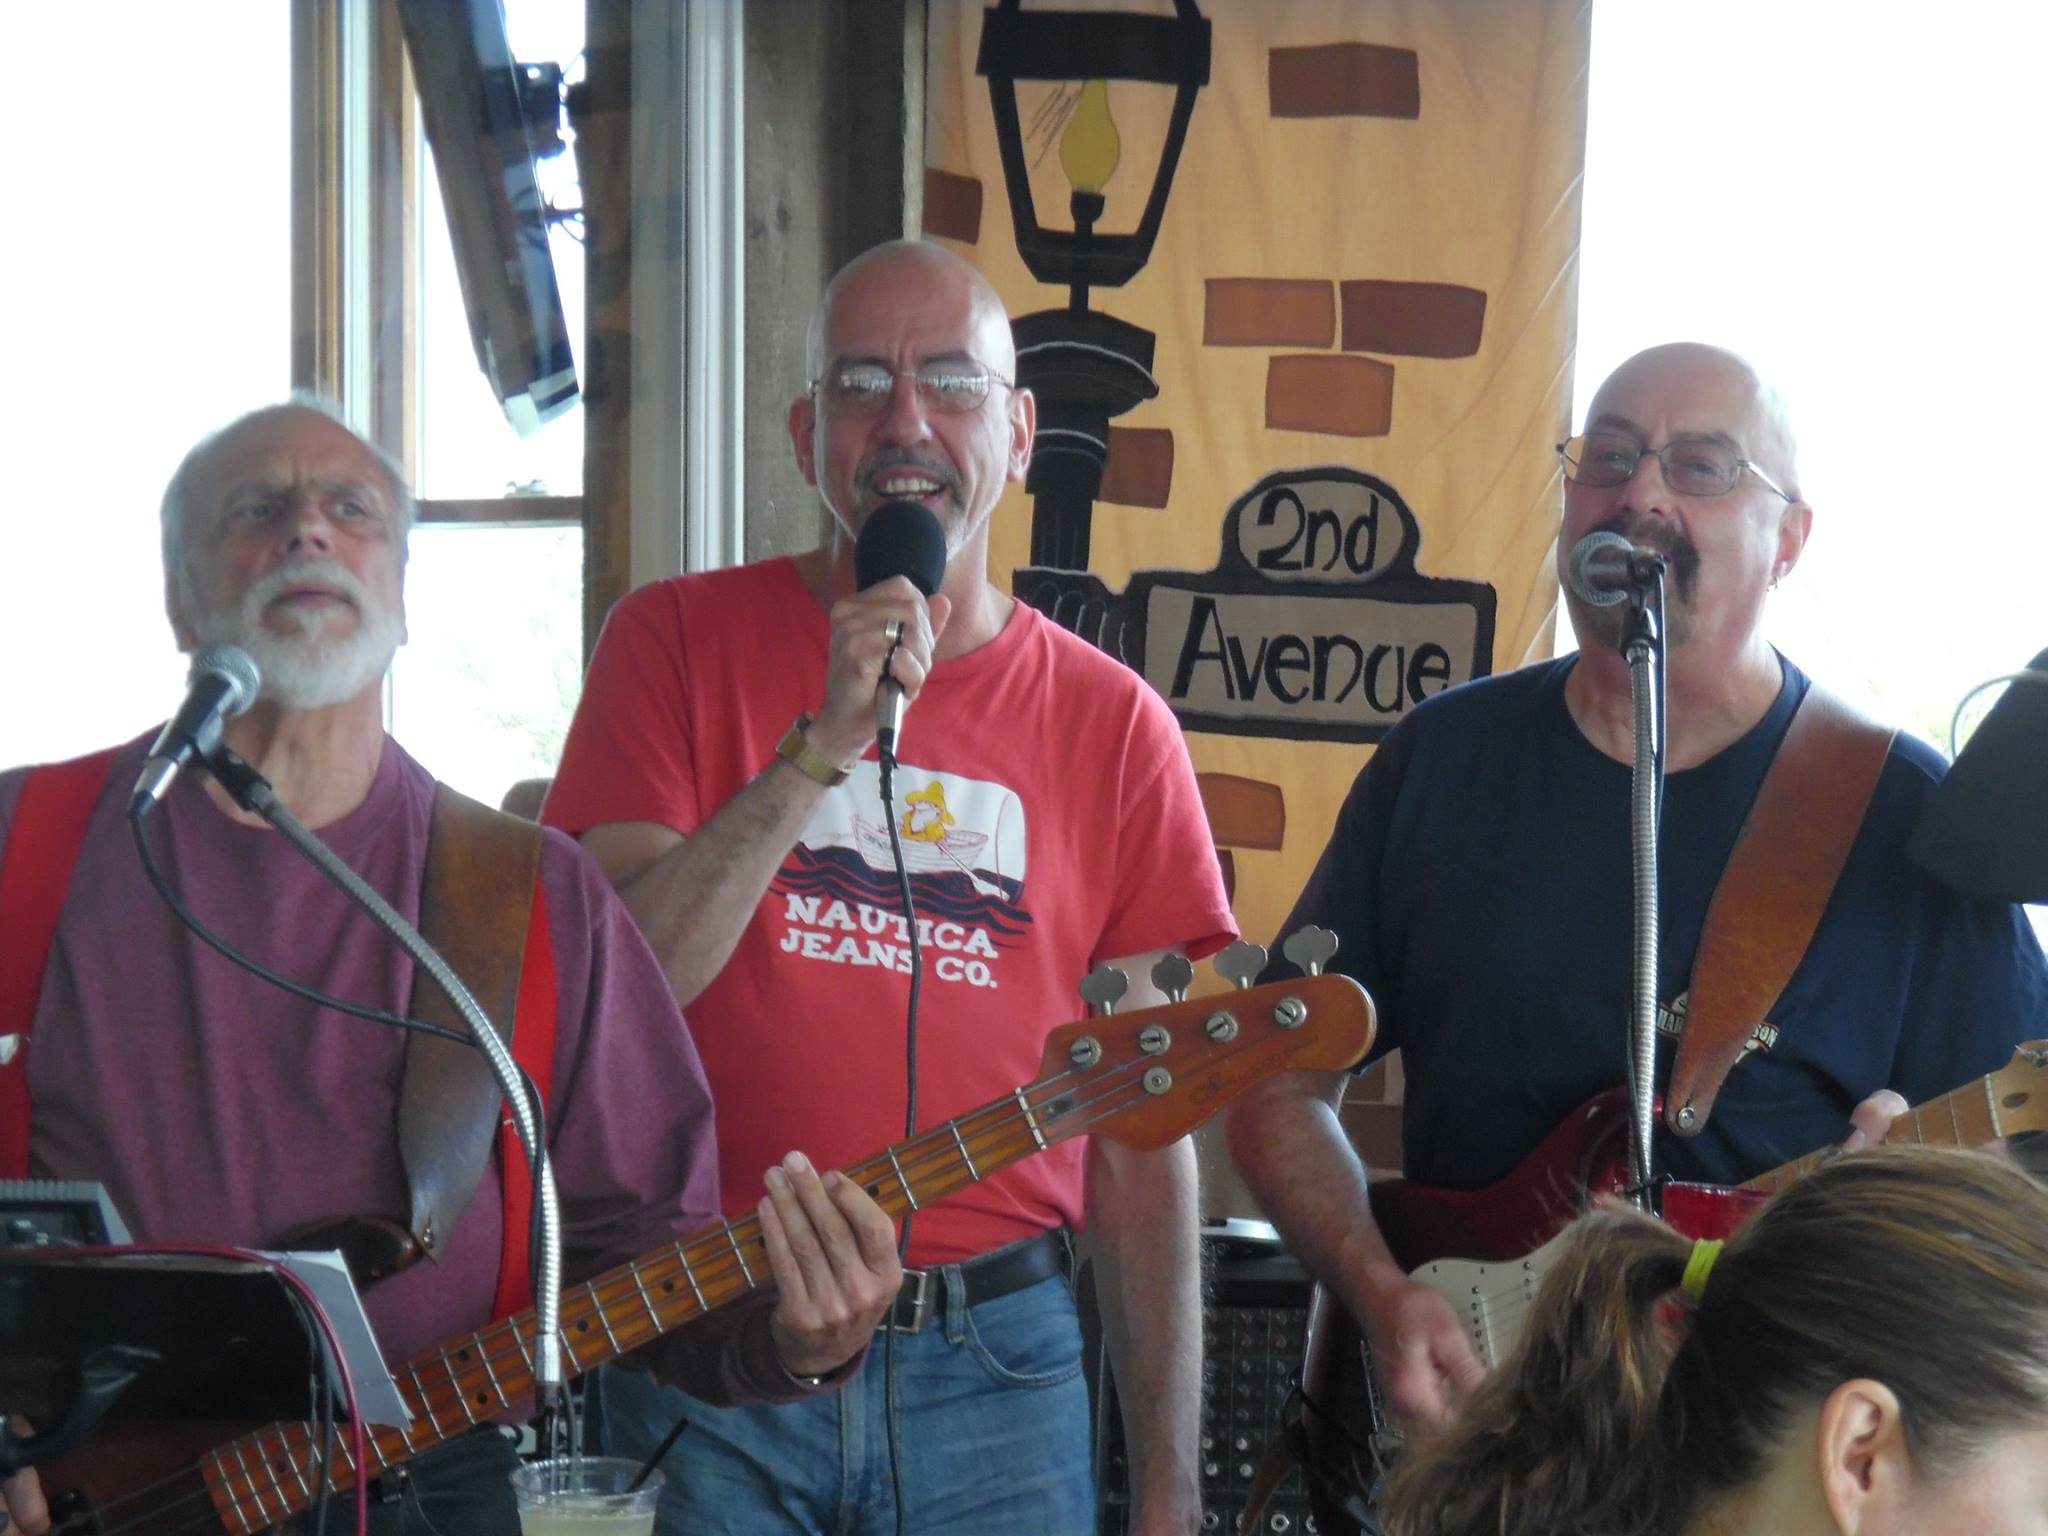 Second Avenue Band Rhode Island